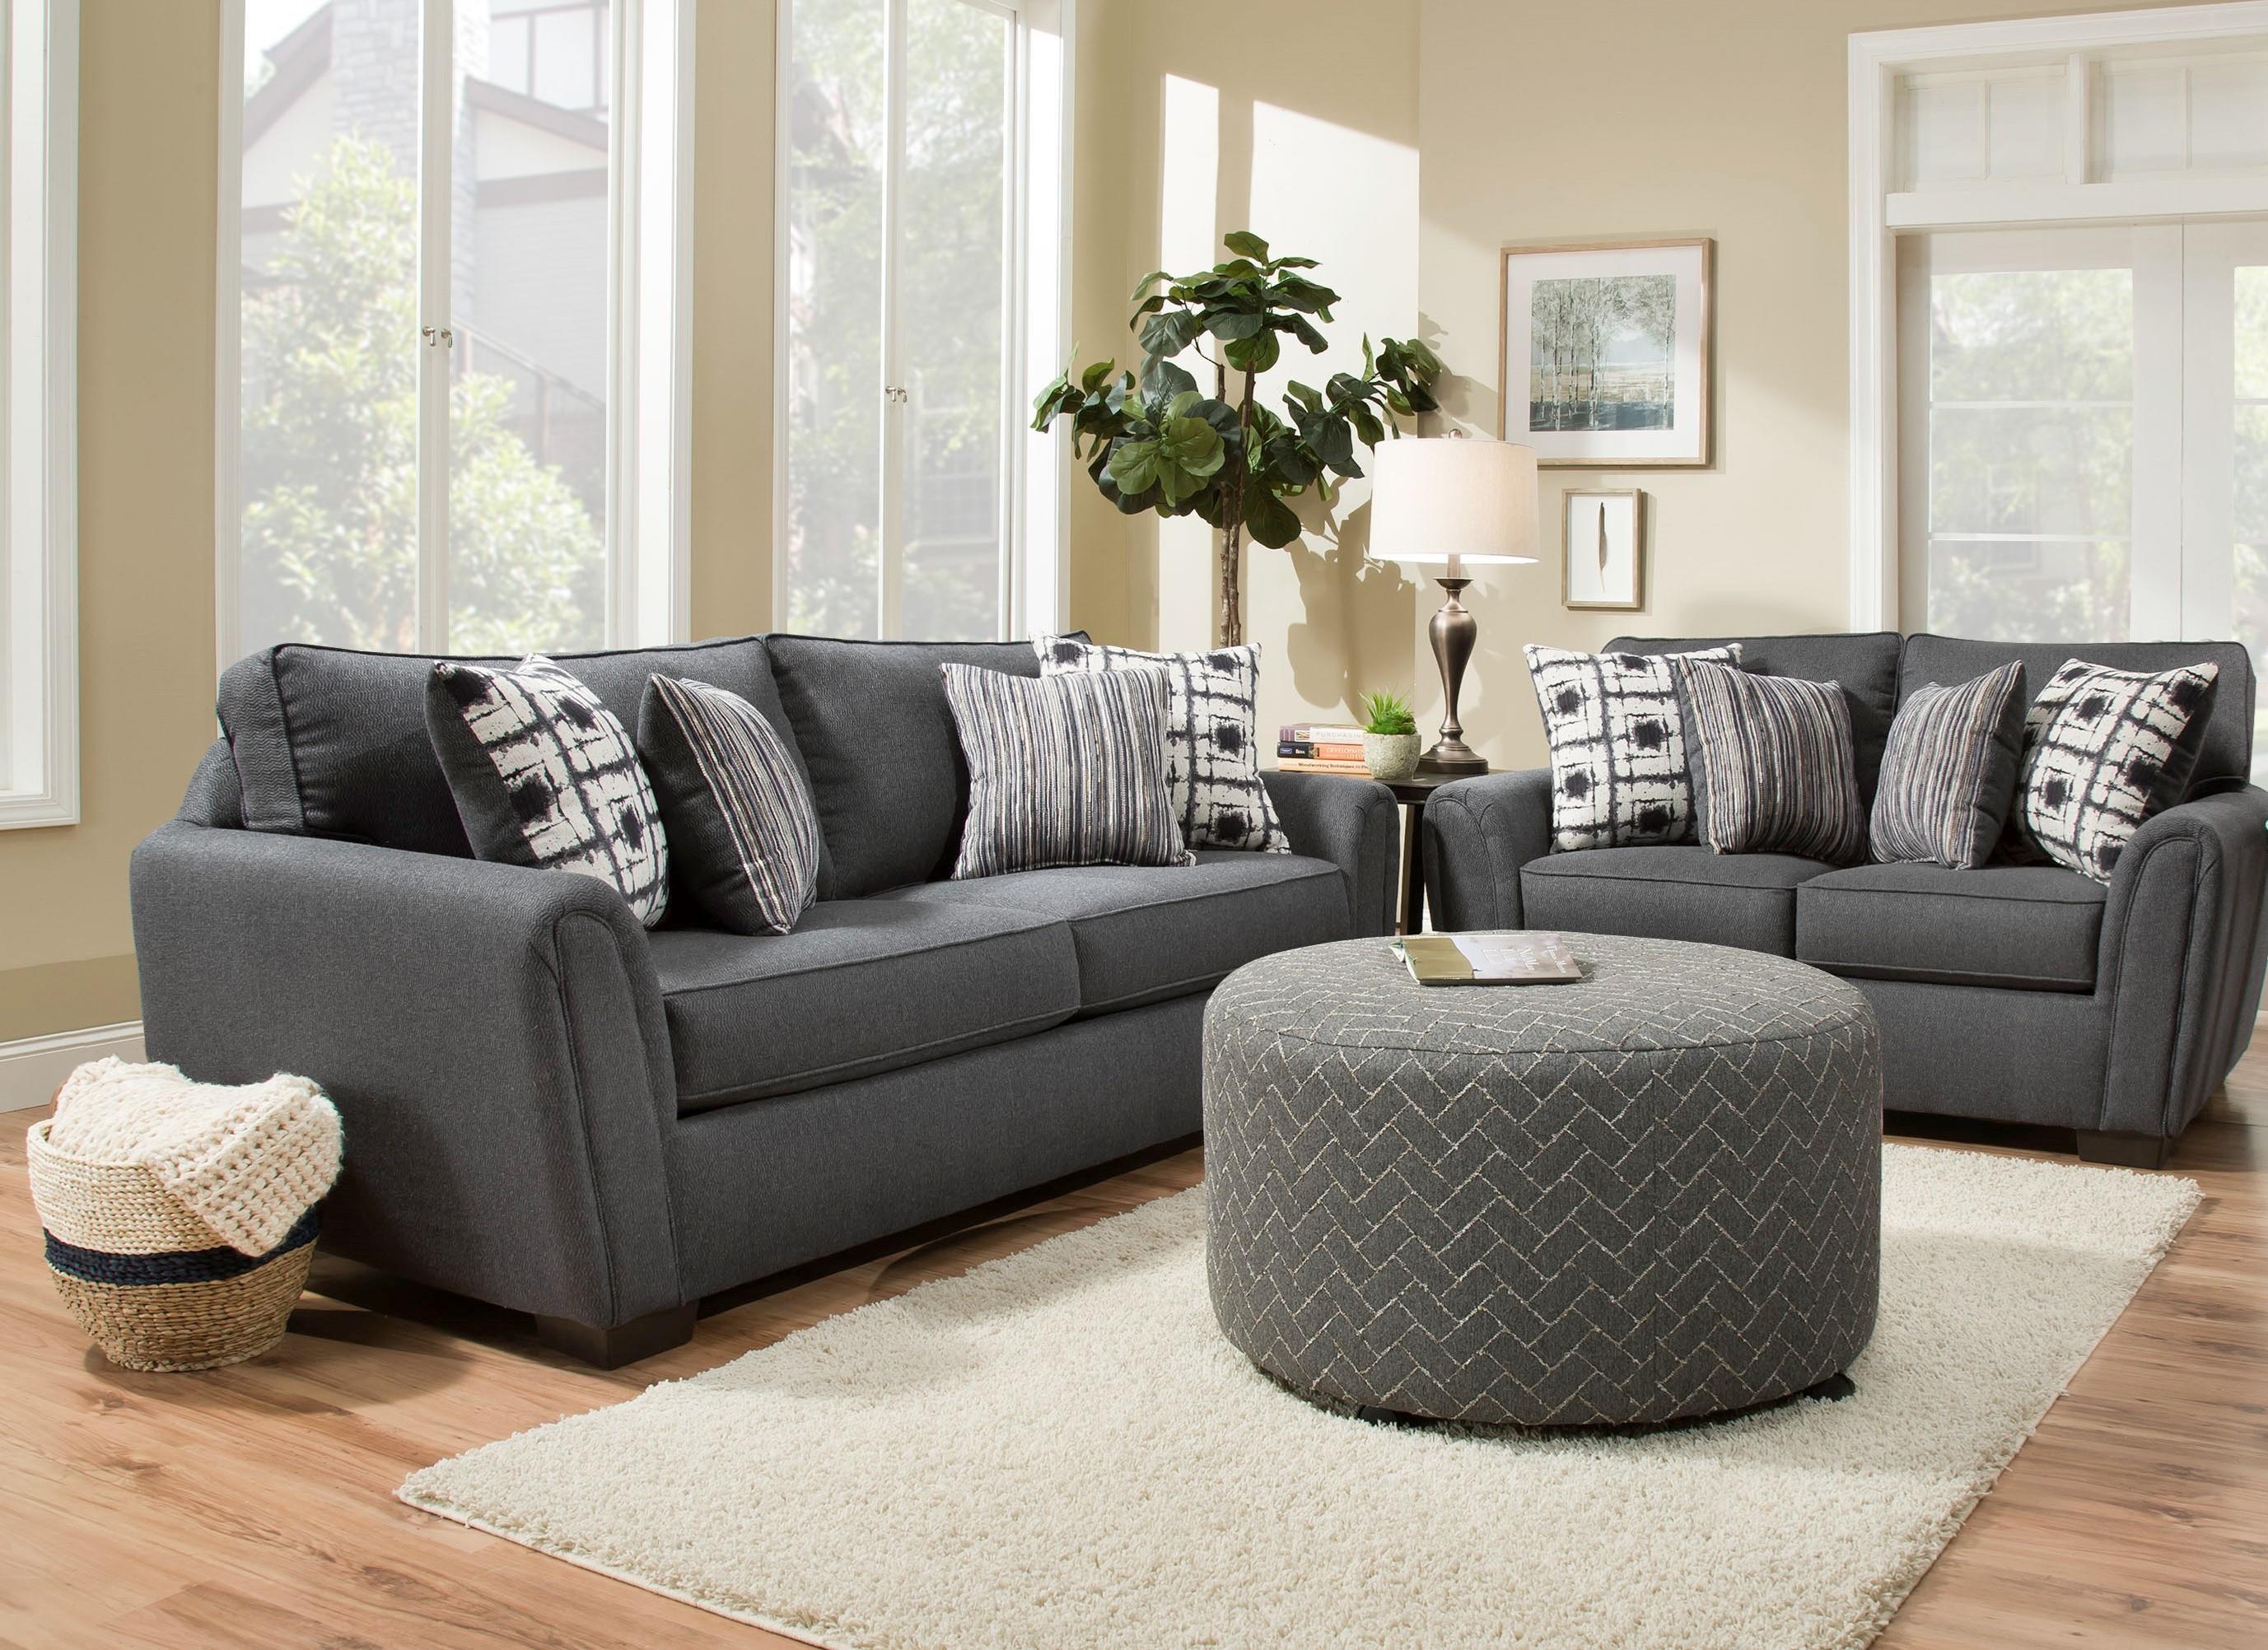 Corinthian Rapids Sofa and Loveseat Set - Item Number: GRP-737X-S L